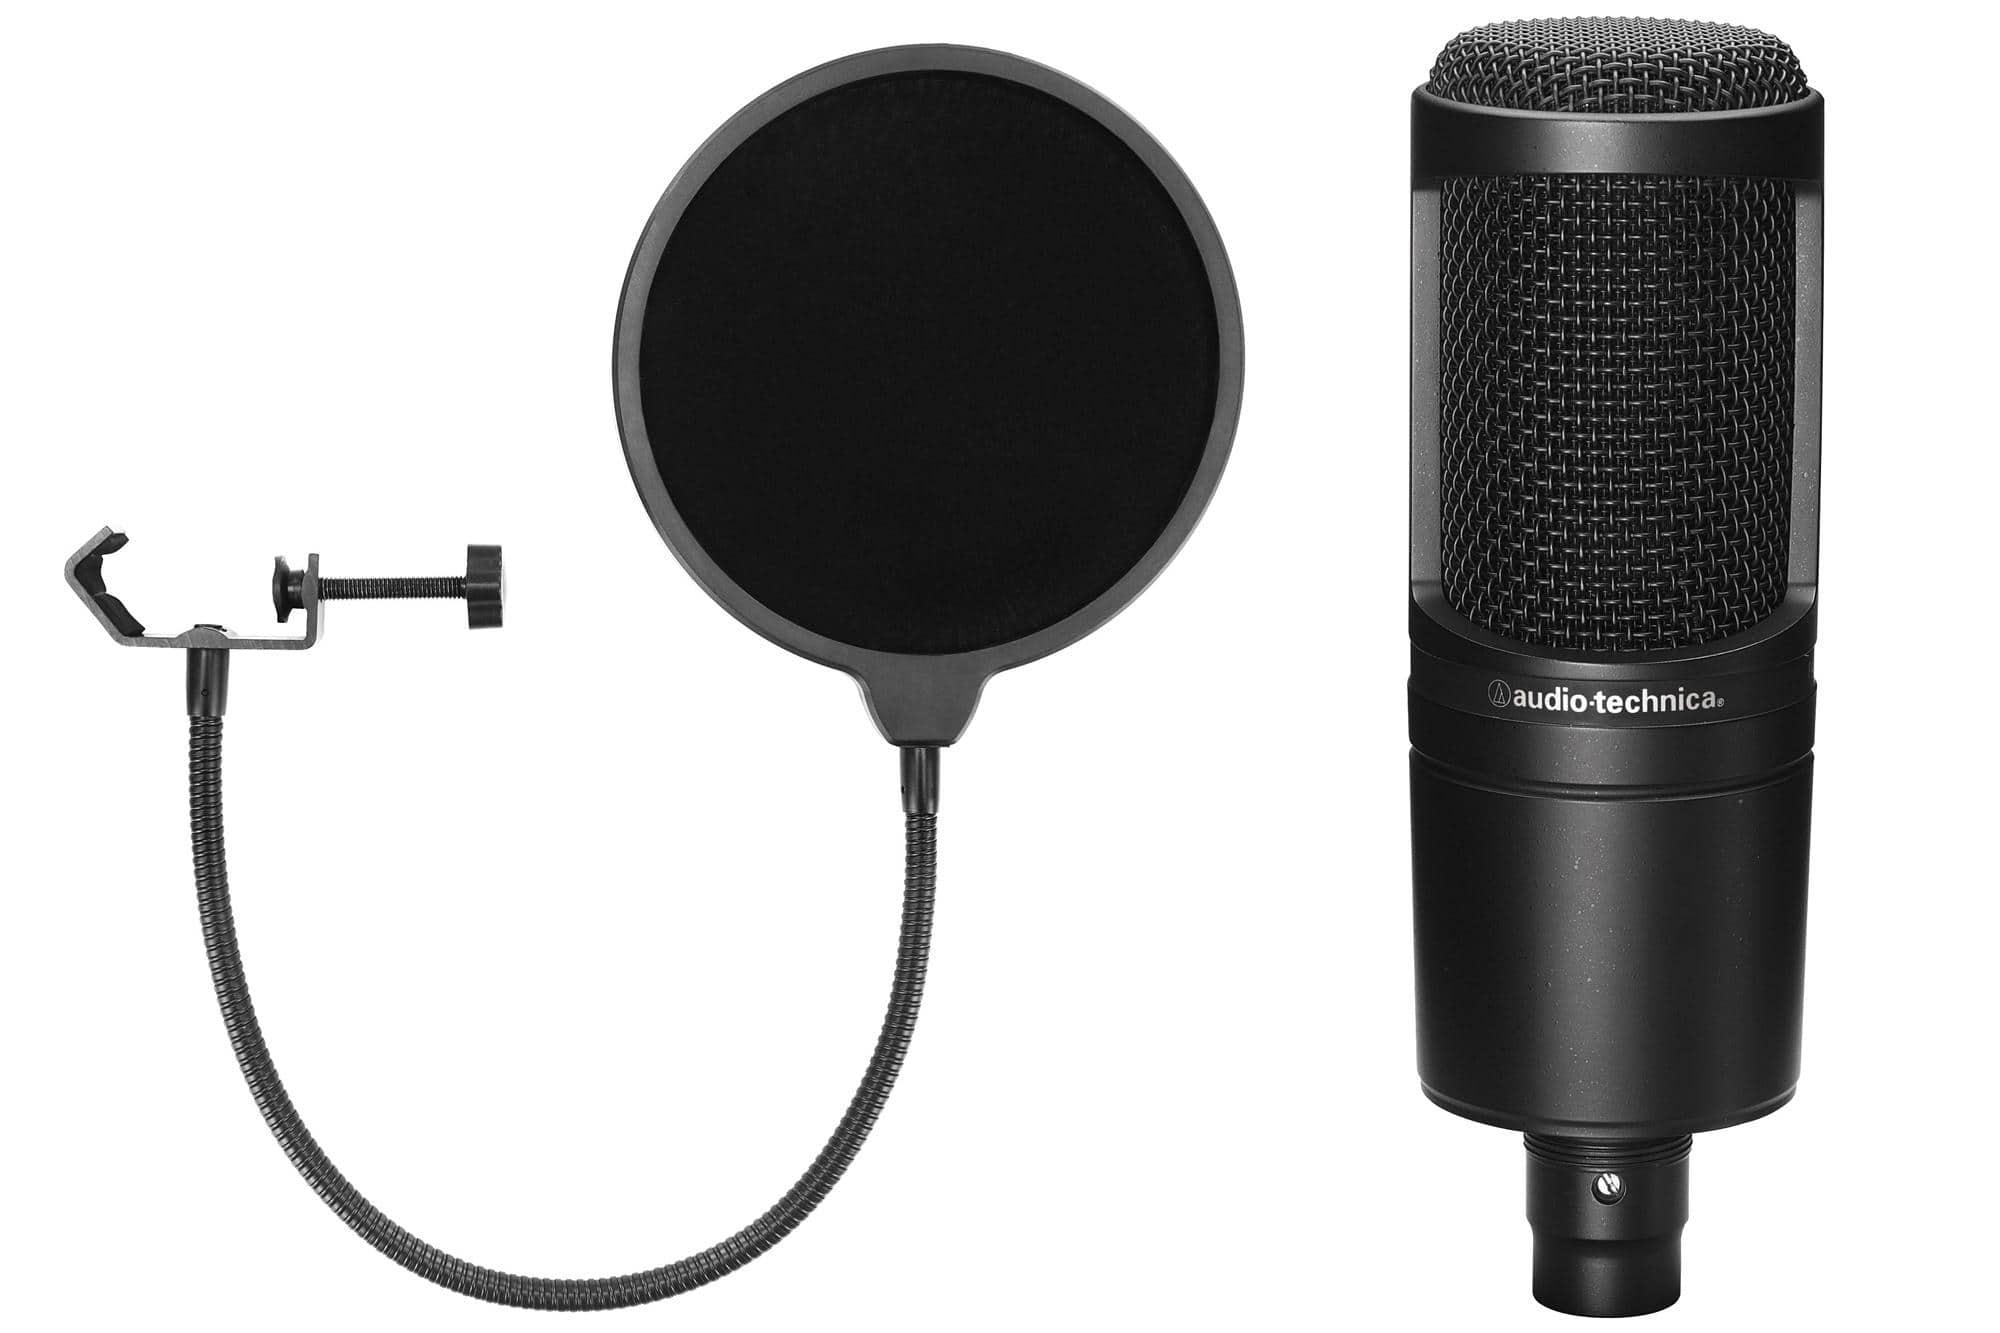 Audio Technica AT2020 Kondensatormikrofon Set inkl. Popkiller